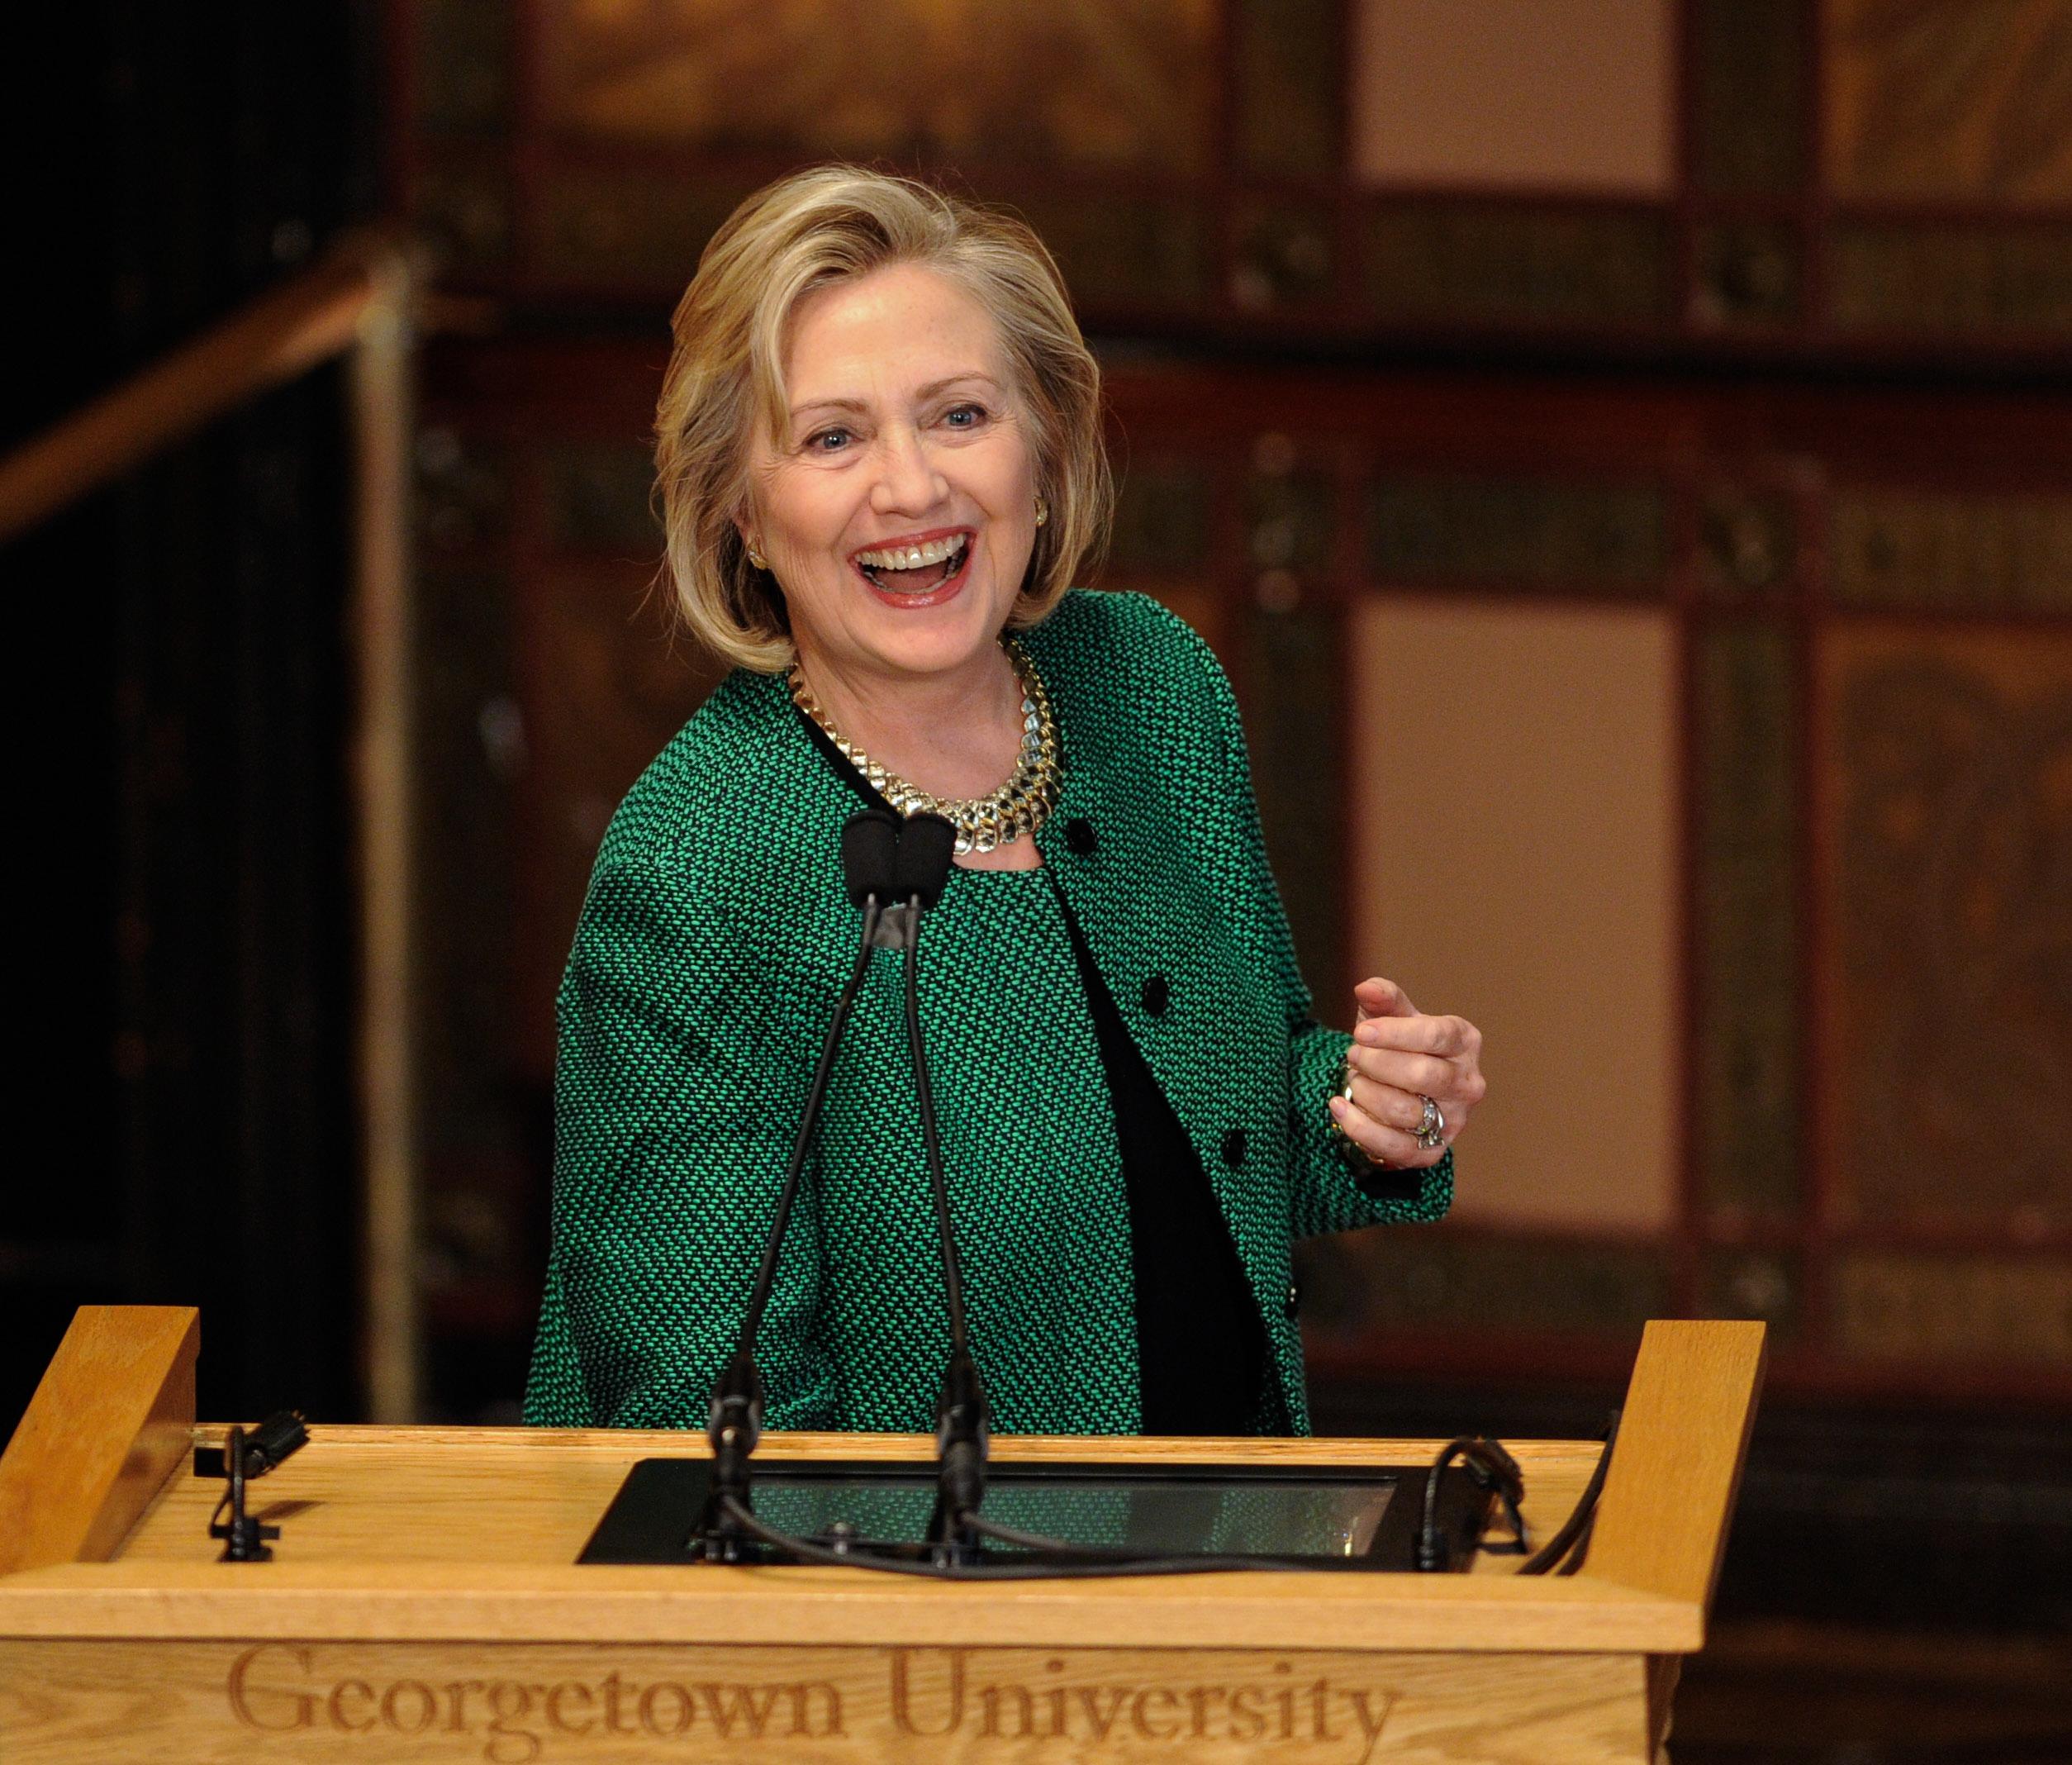 U.S.-NEW YORK-HILLARY CLINTON-PRESIDENTIAL ELECTION-ANNOUNCEMENT